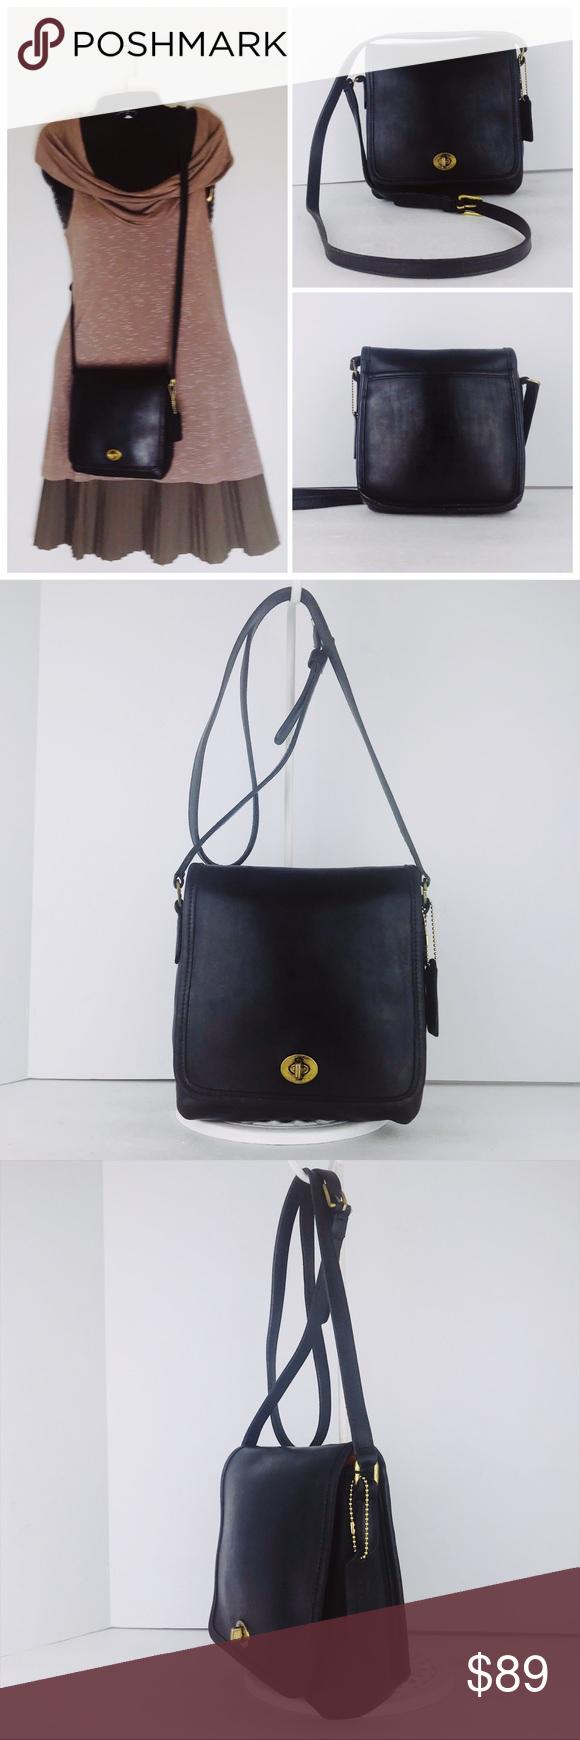 90254c480b 👛Coach Vintage Leather Companion Crossbody Bag Coach Companion Flap